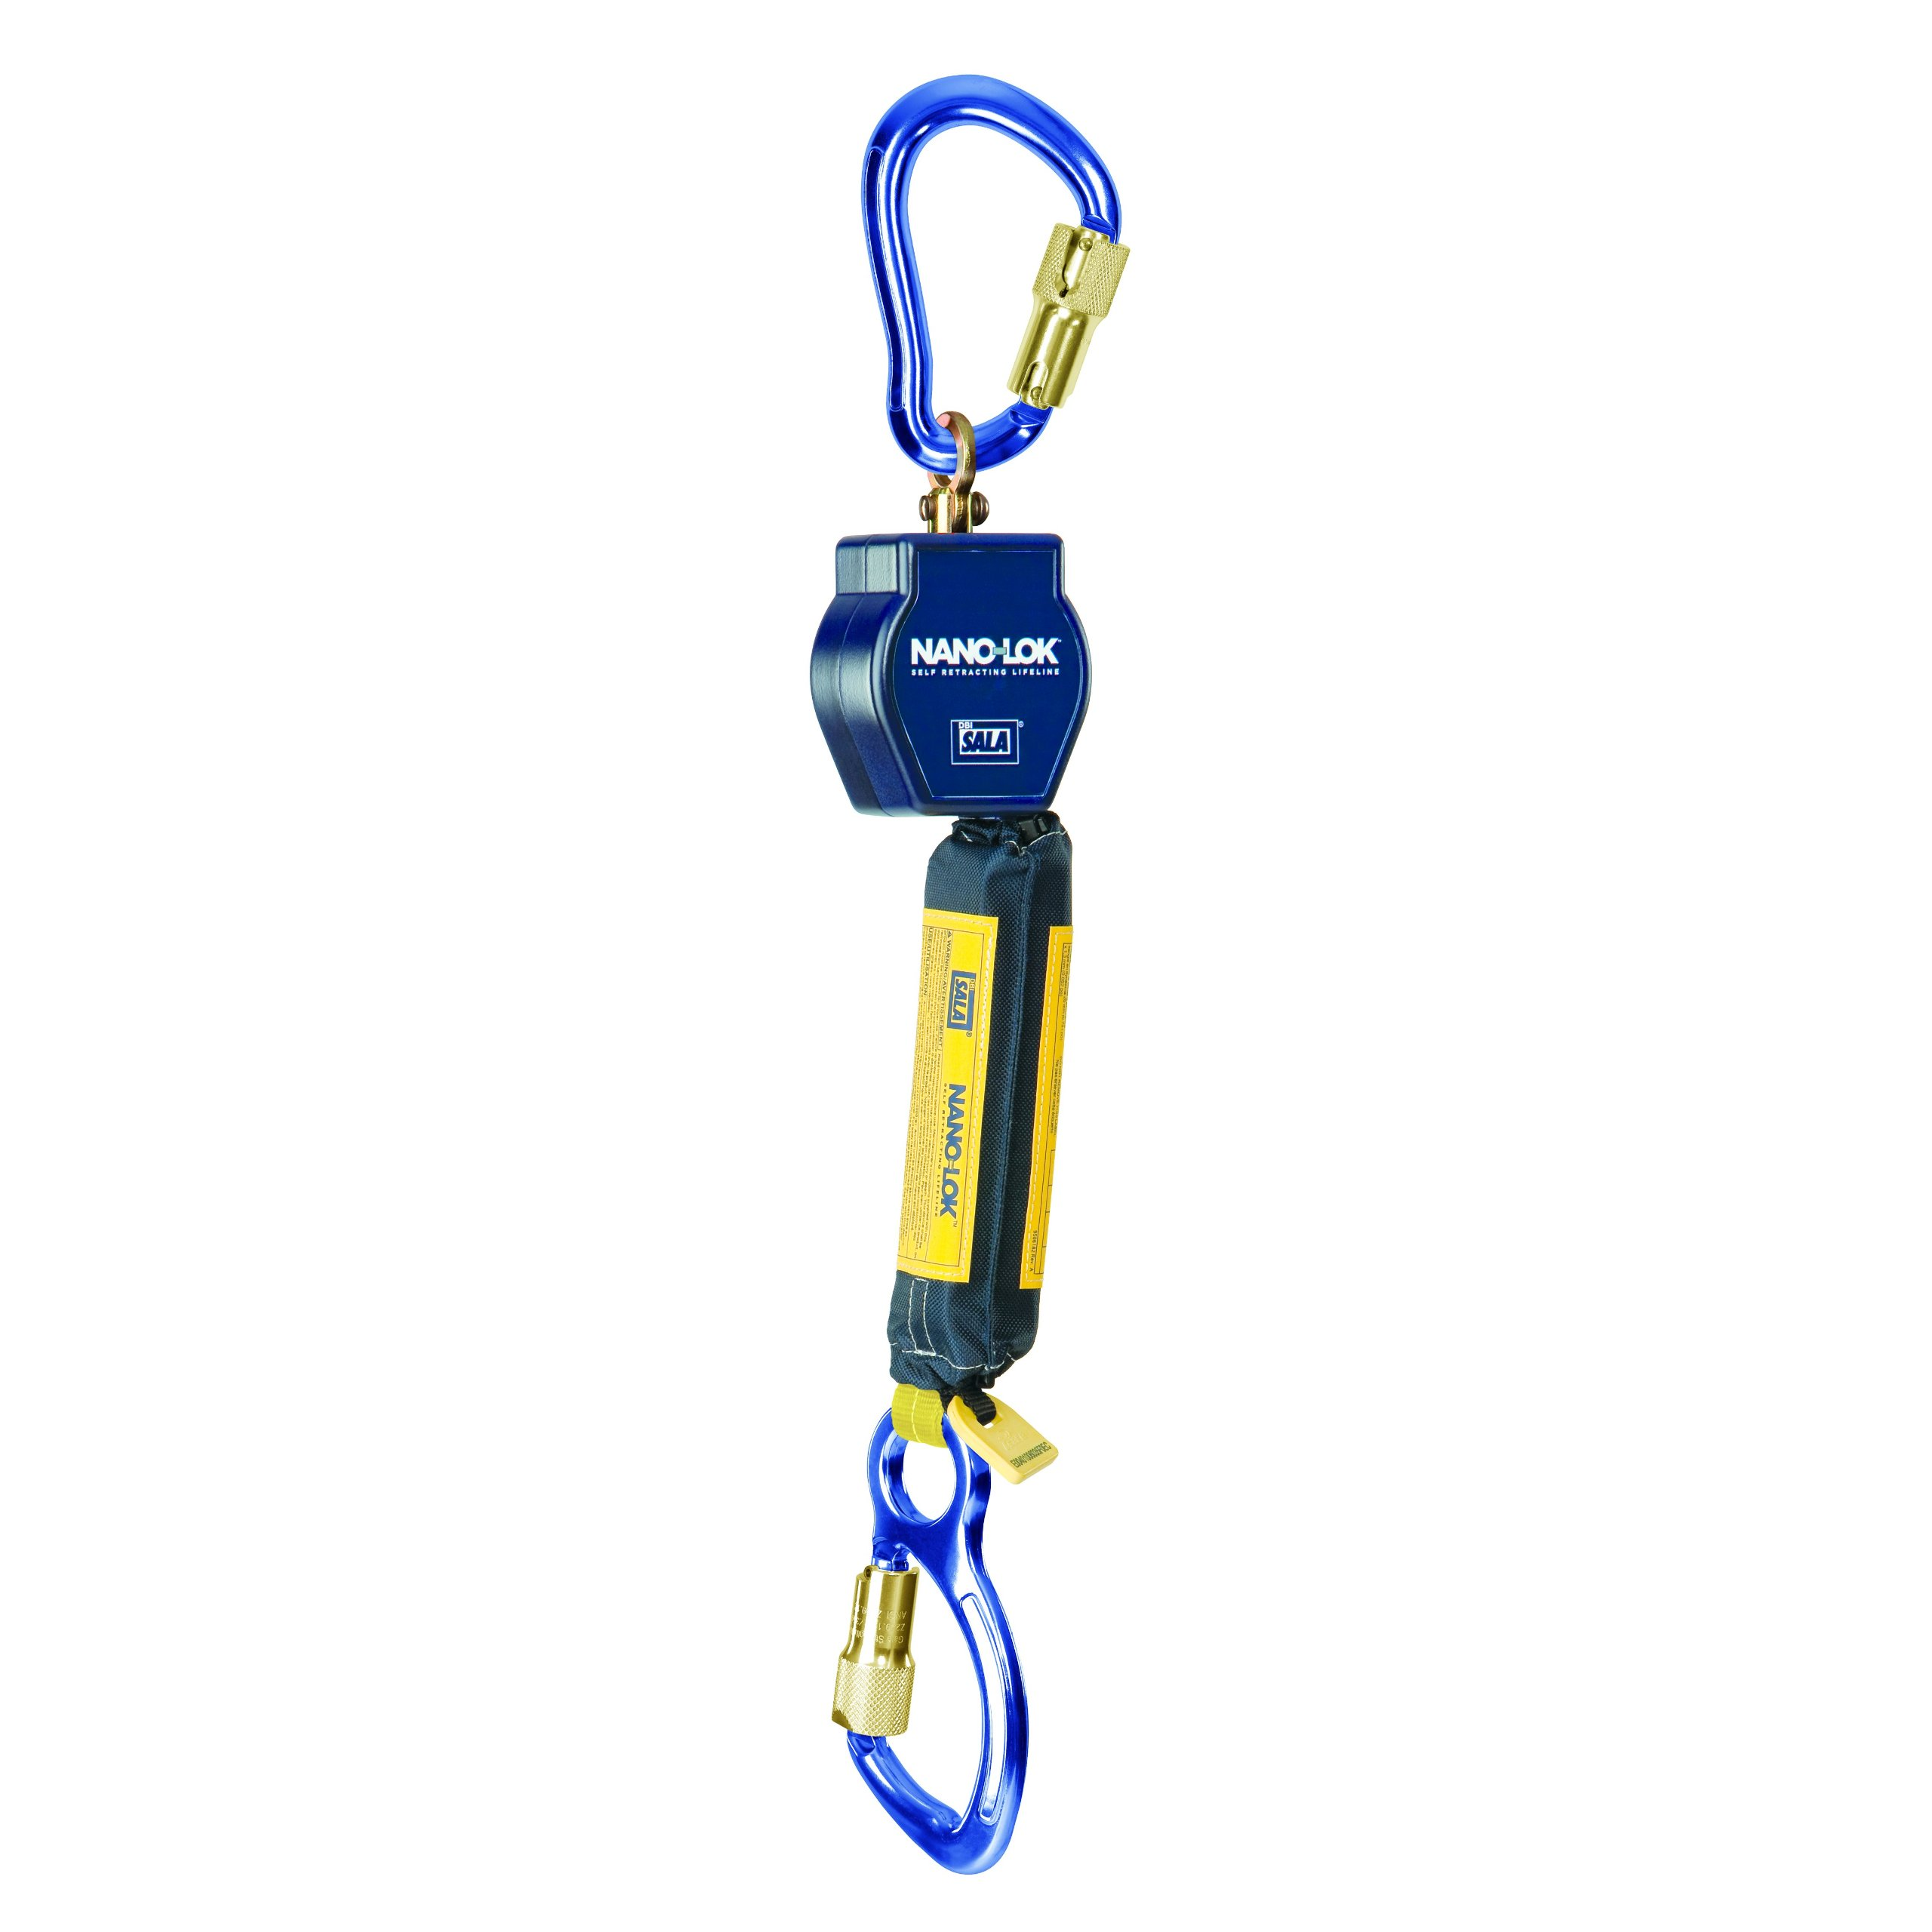 3M DBI-SALA Nano-Lok 3101235 Self Retracting Lifeline, 6', 3/4'' Dynema Polyester Web, Aluminum Carabiner, Swiveling Anchor Loop with Aluminum Carabiner, Blue by 3M Personal Protective Equipment